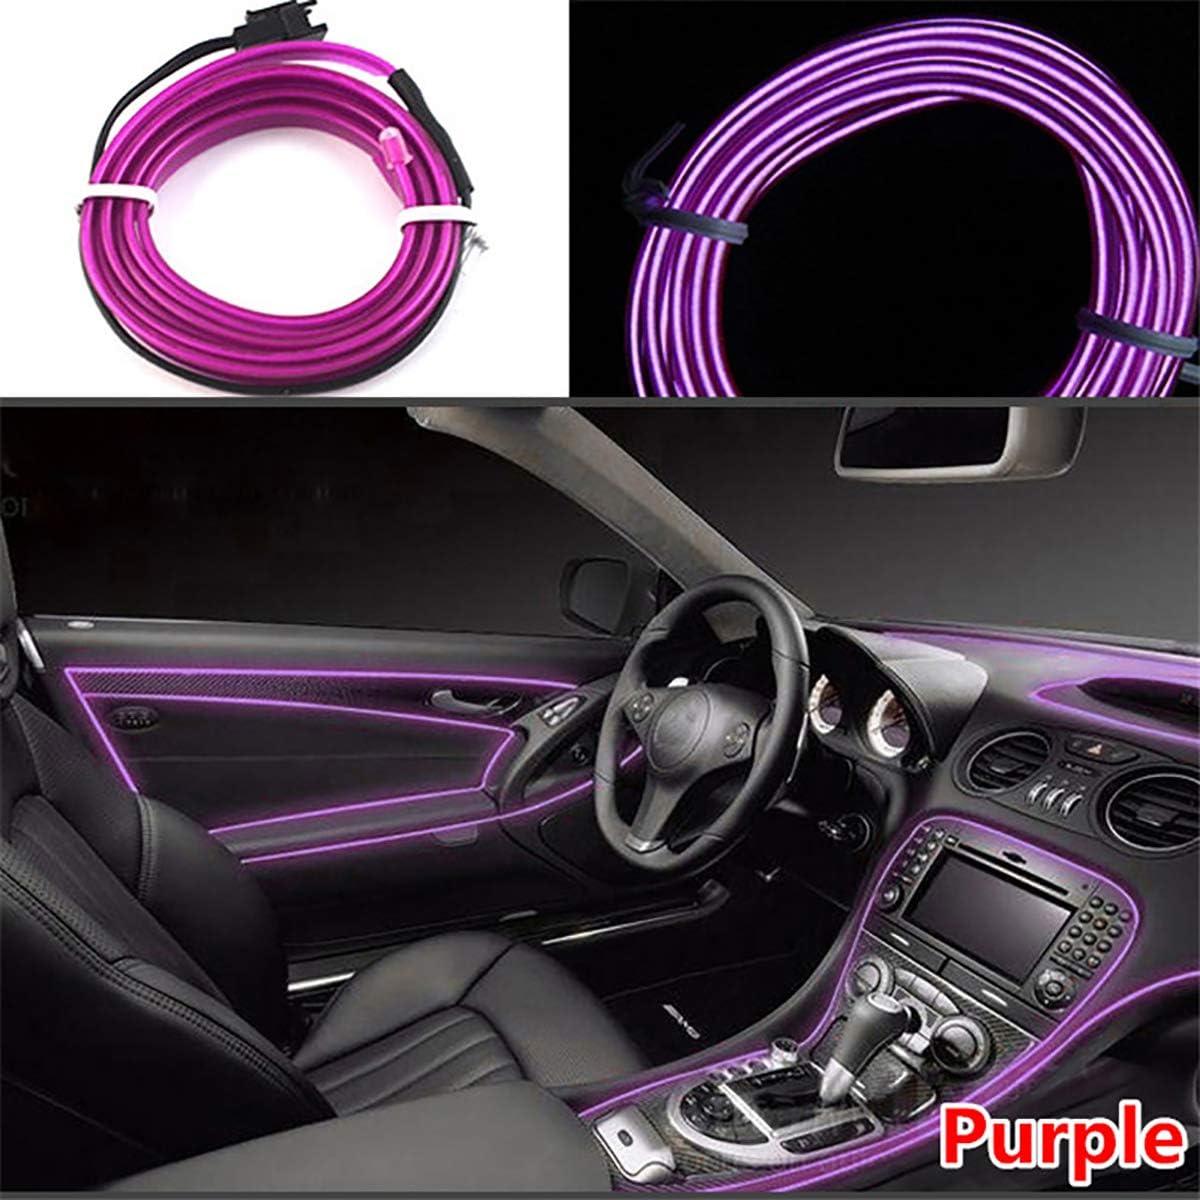 Vilihy 5 Meters Car Interior Lighting Auto LED Strip EL Wire Rope Auto Atmosphere Decorative Lamp Flexible Neon Light DIY